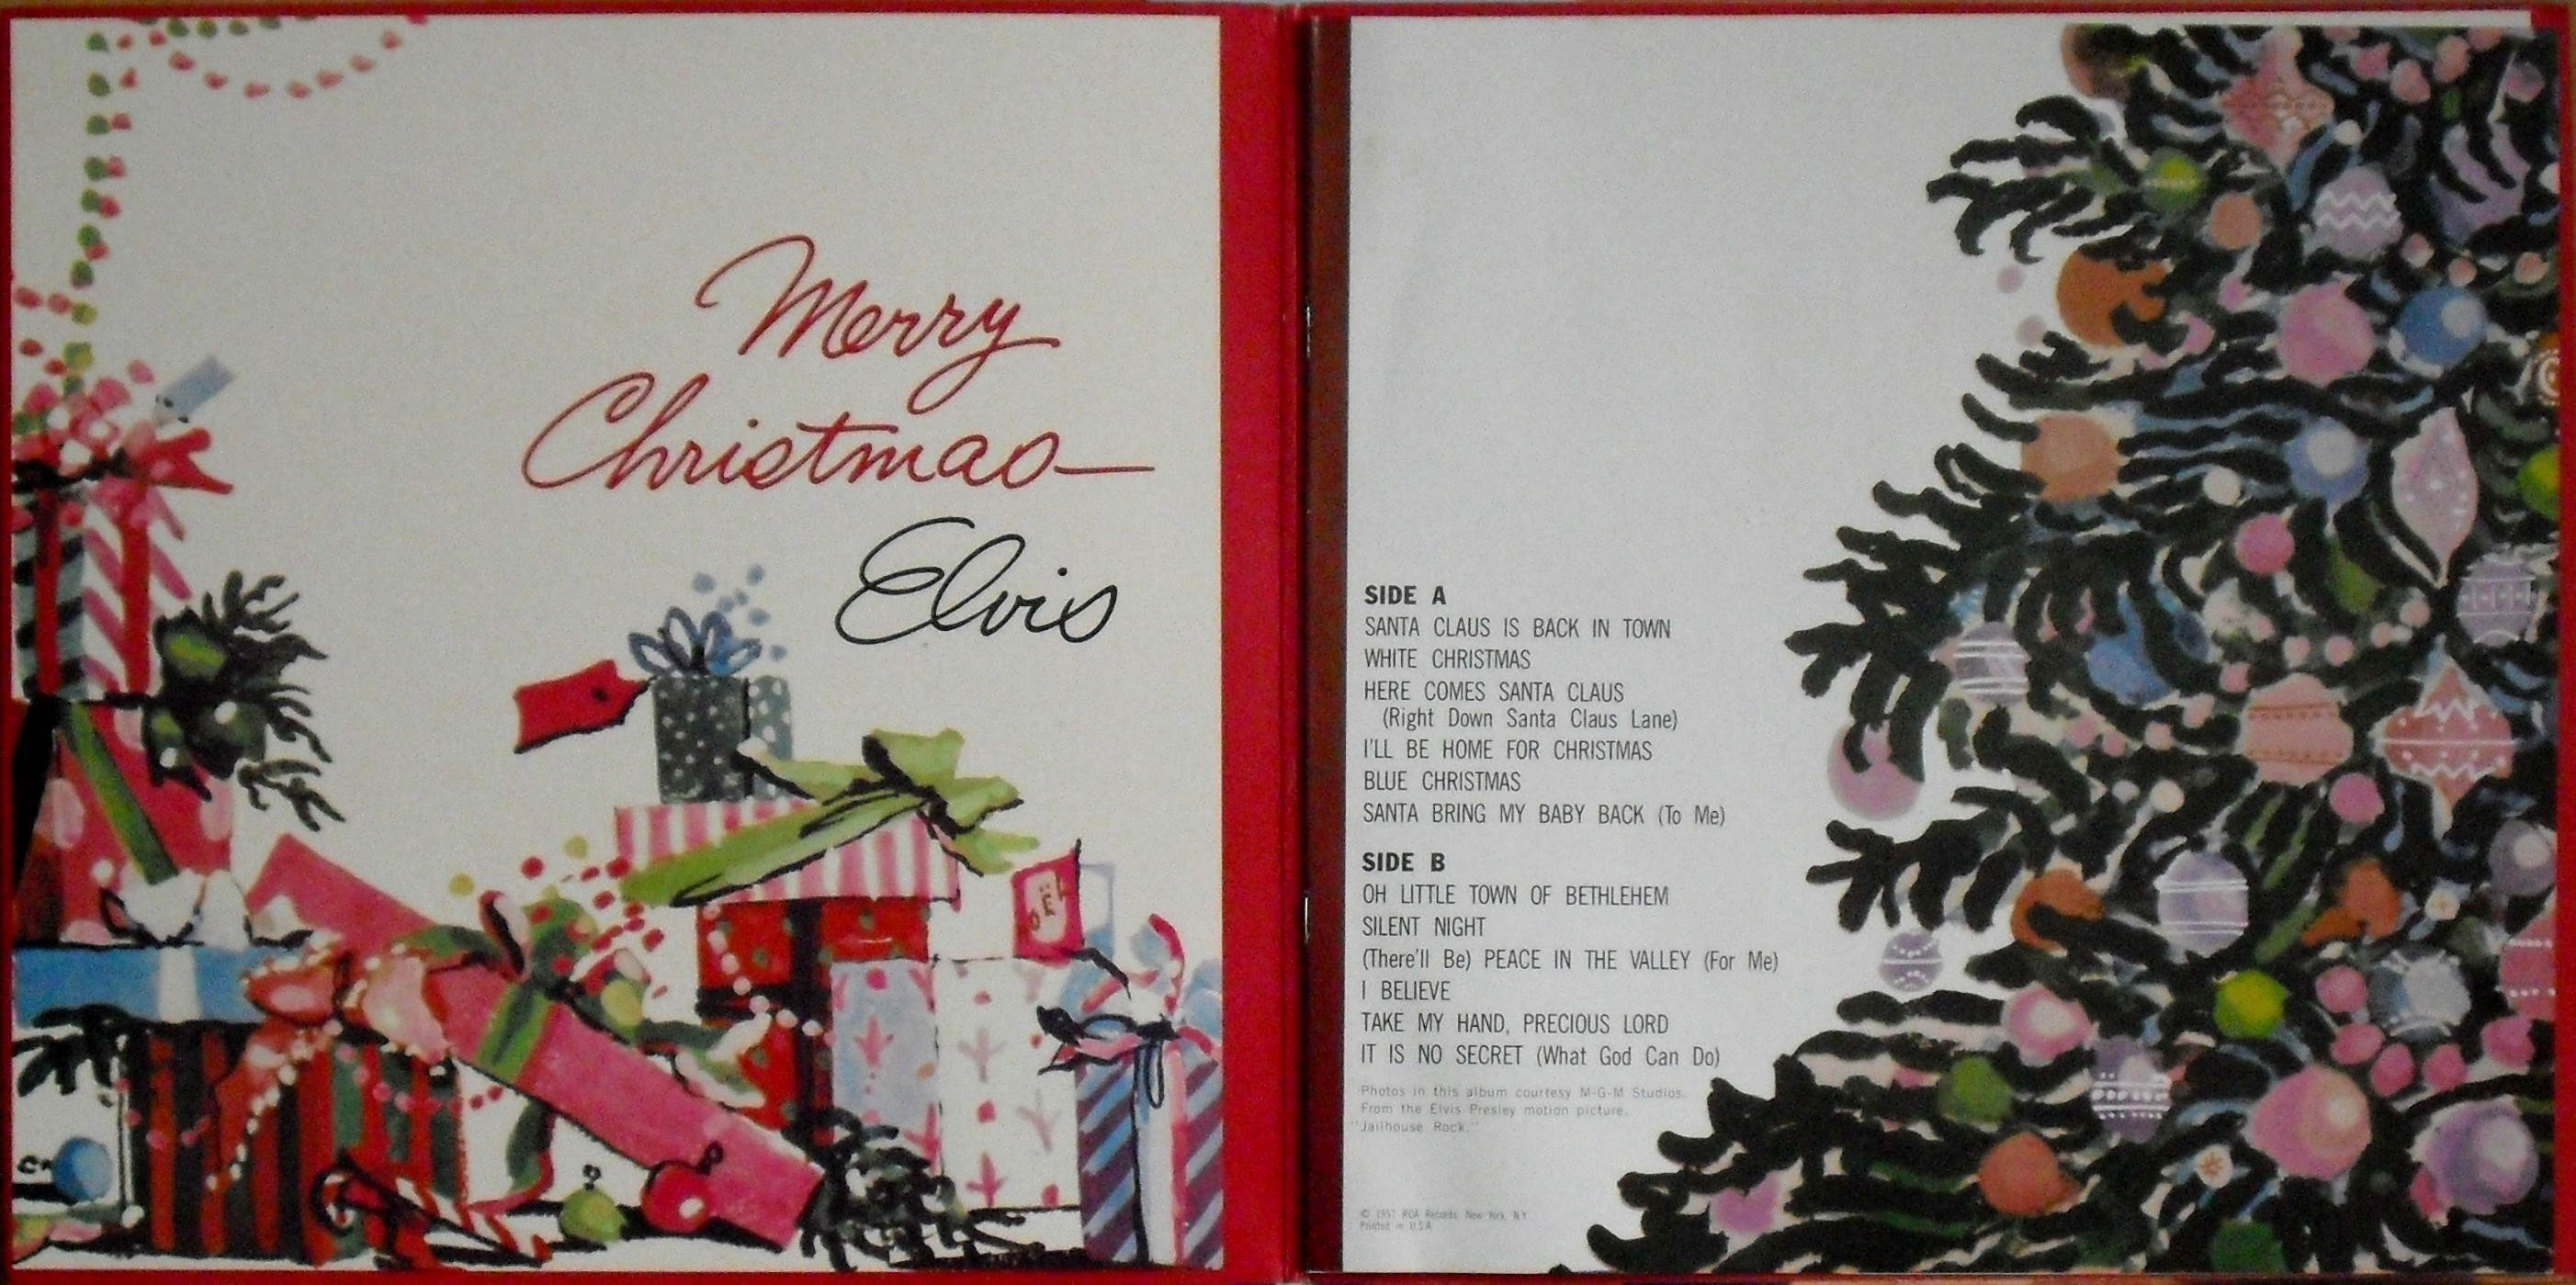 ELVIS' CHRISTMAS ALBUM 04jikc0